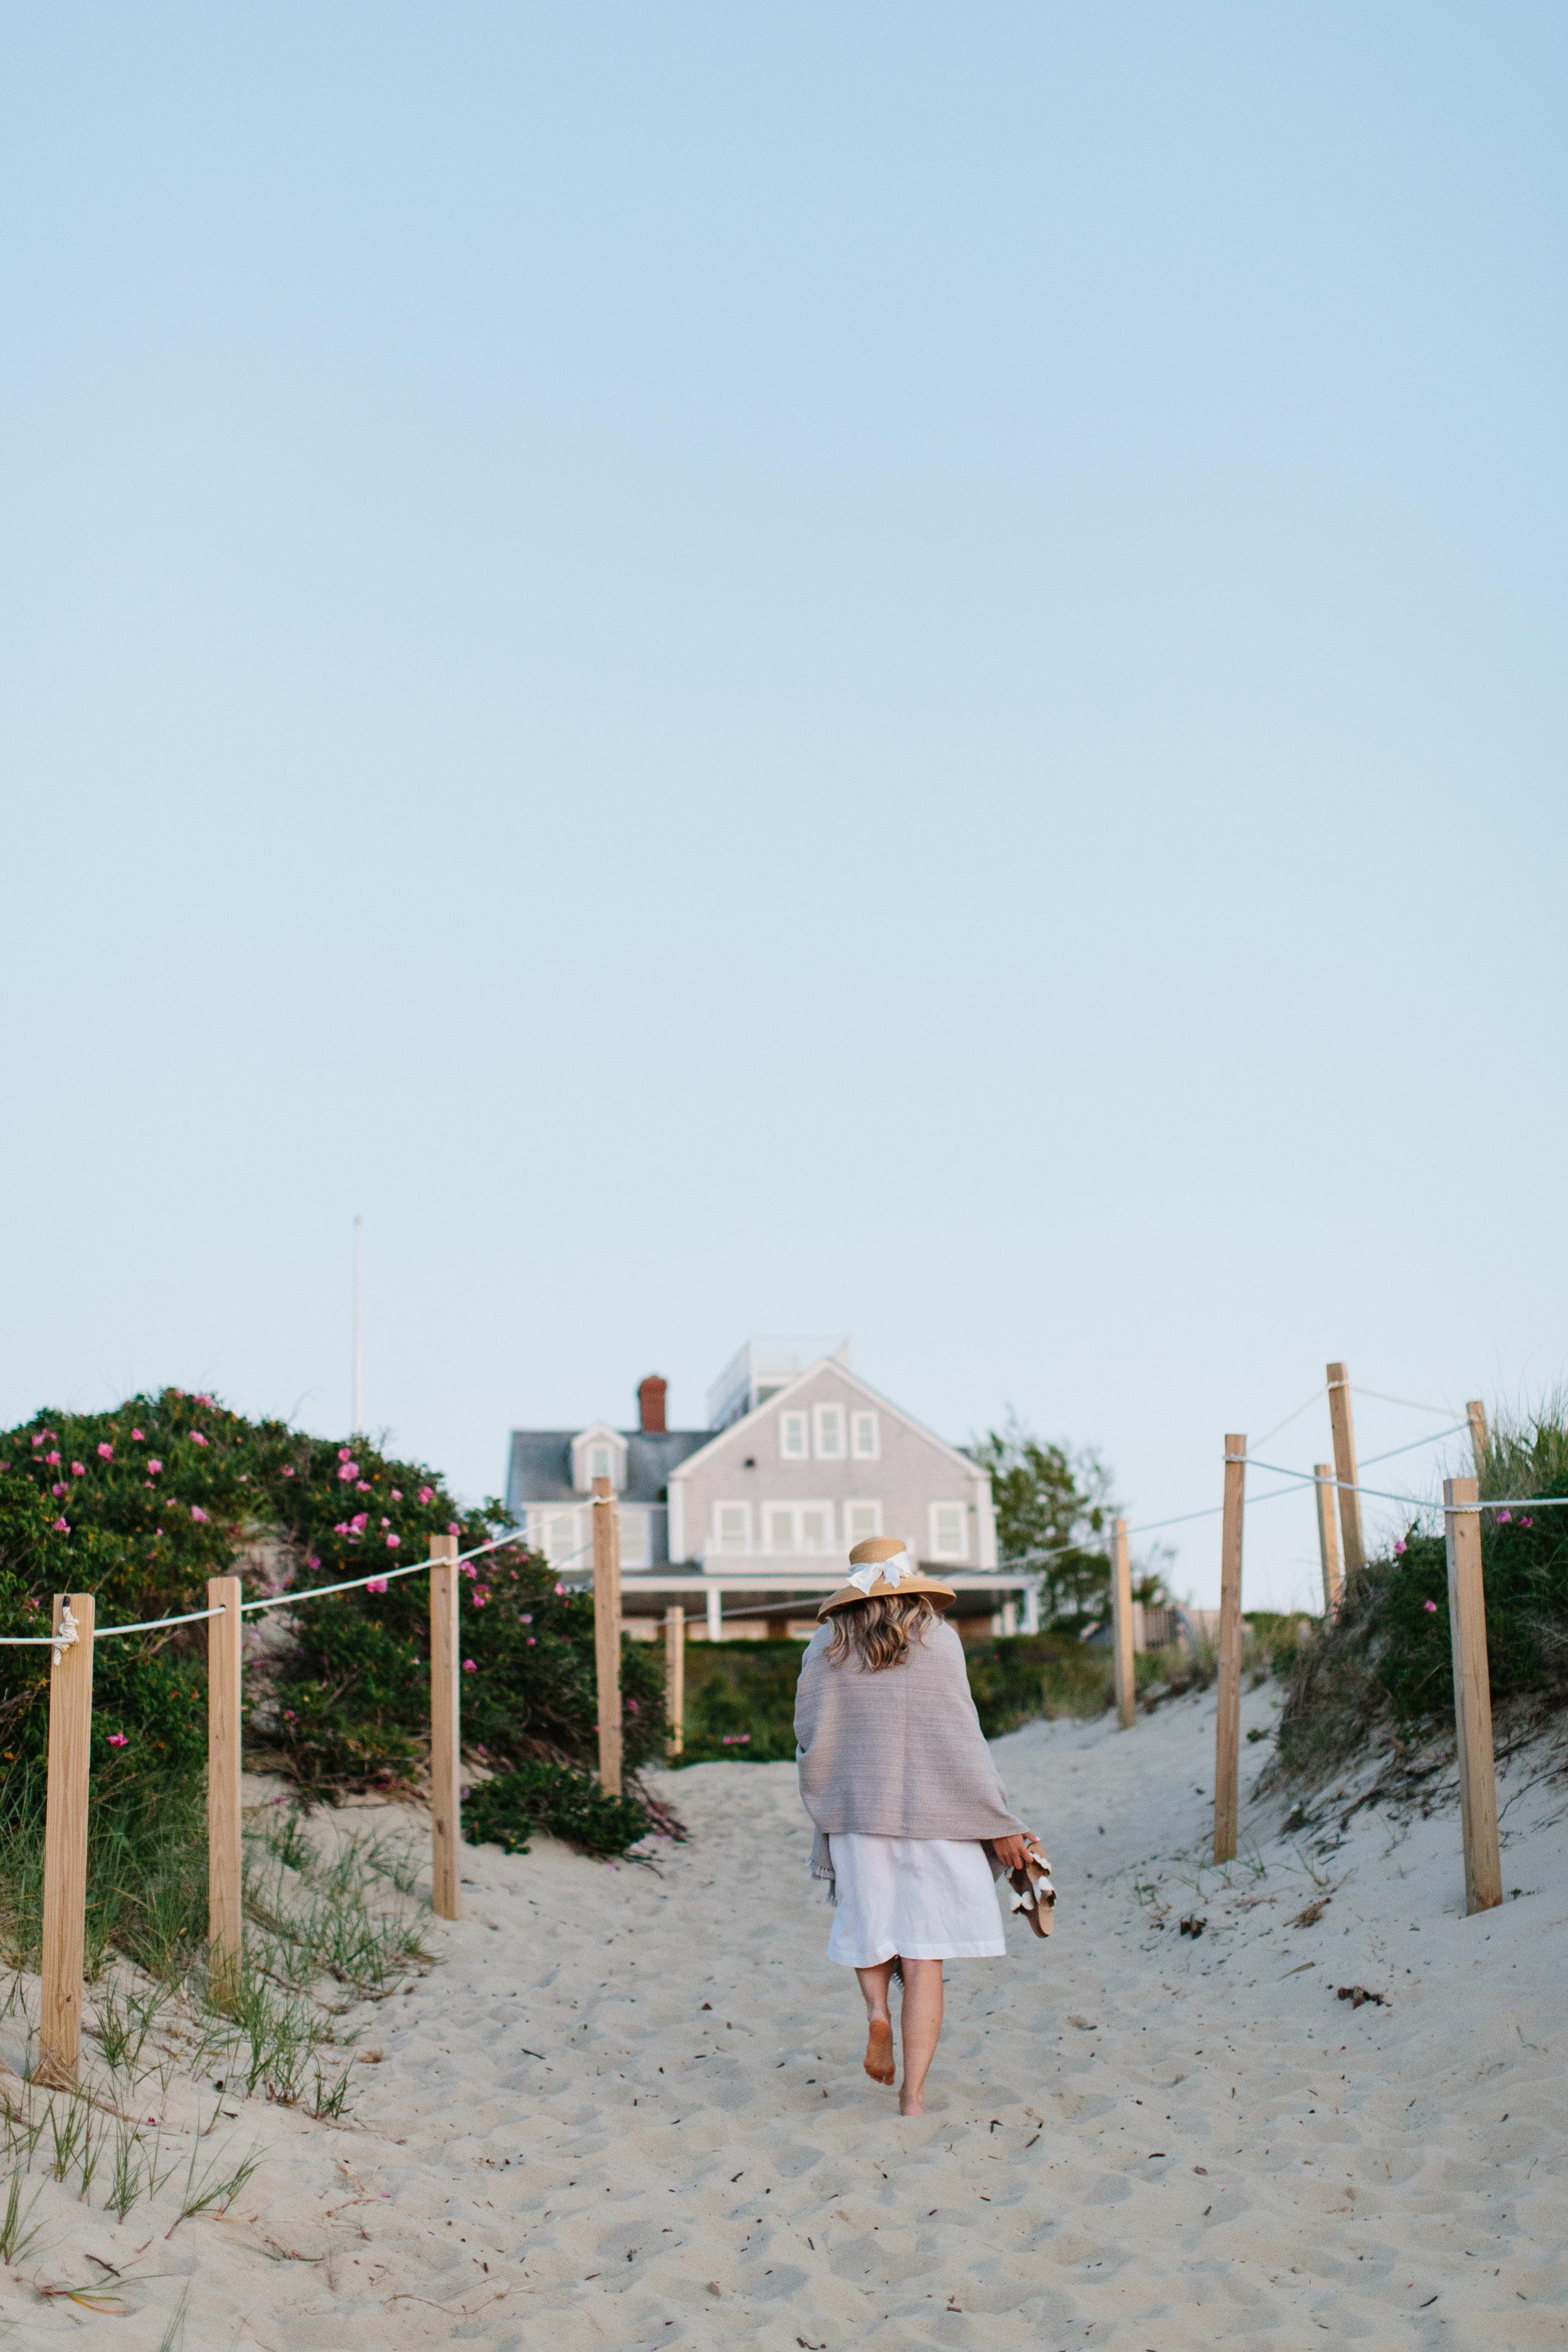 Nantucket Travel Guide New England Travel Blogger Abby Capalbo | Photography: Erin McGinn